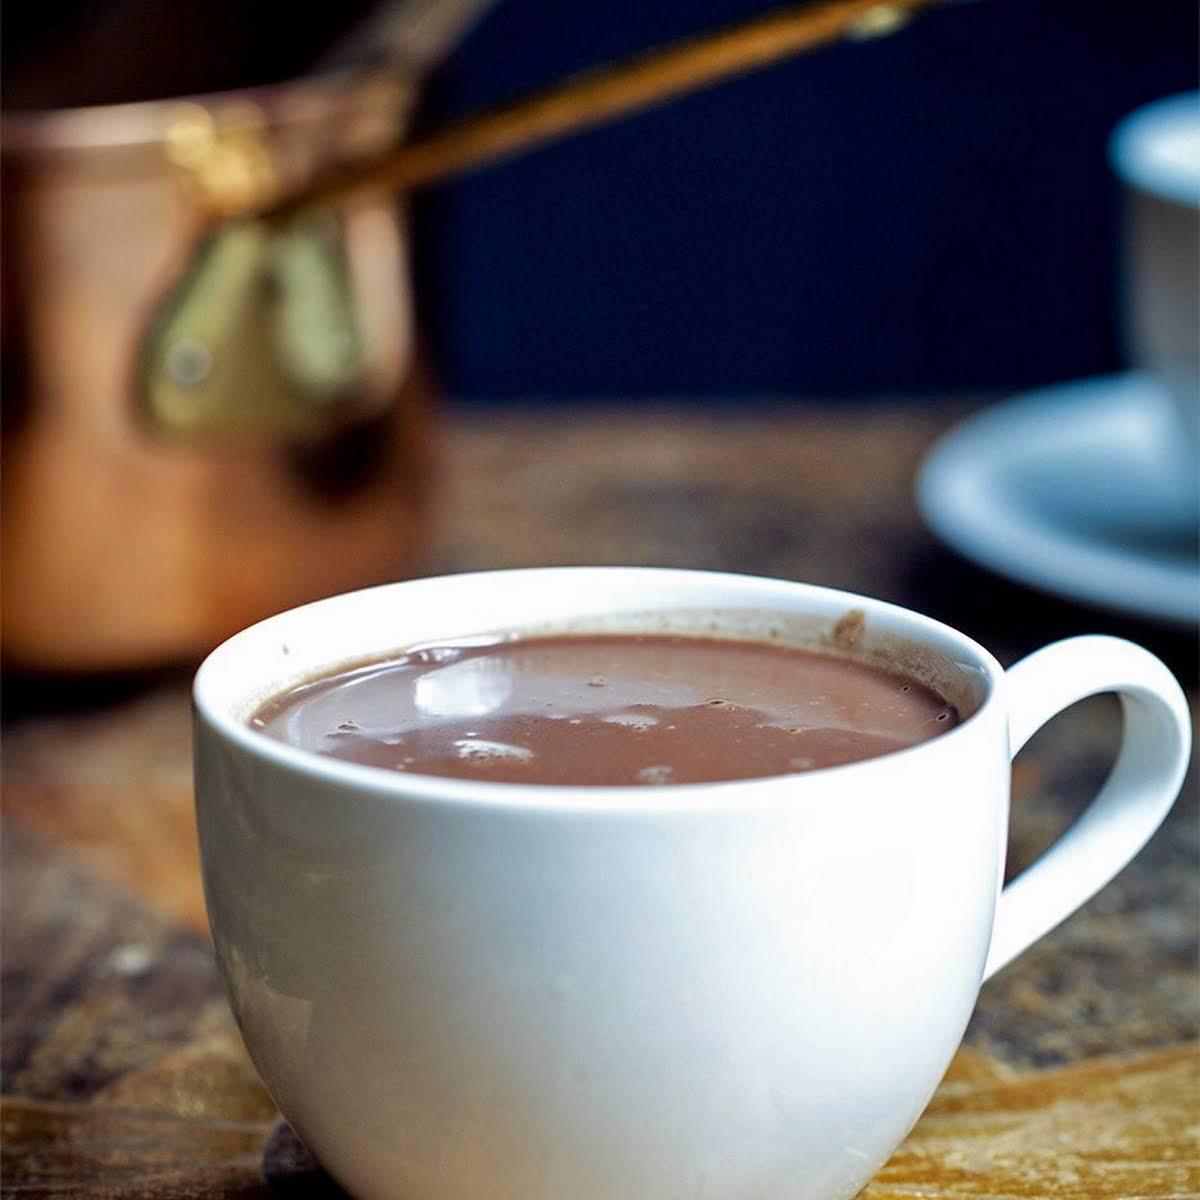 Creamy Dairy-Free Hot Chocolate